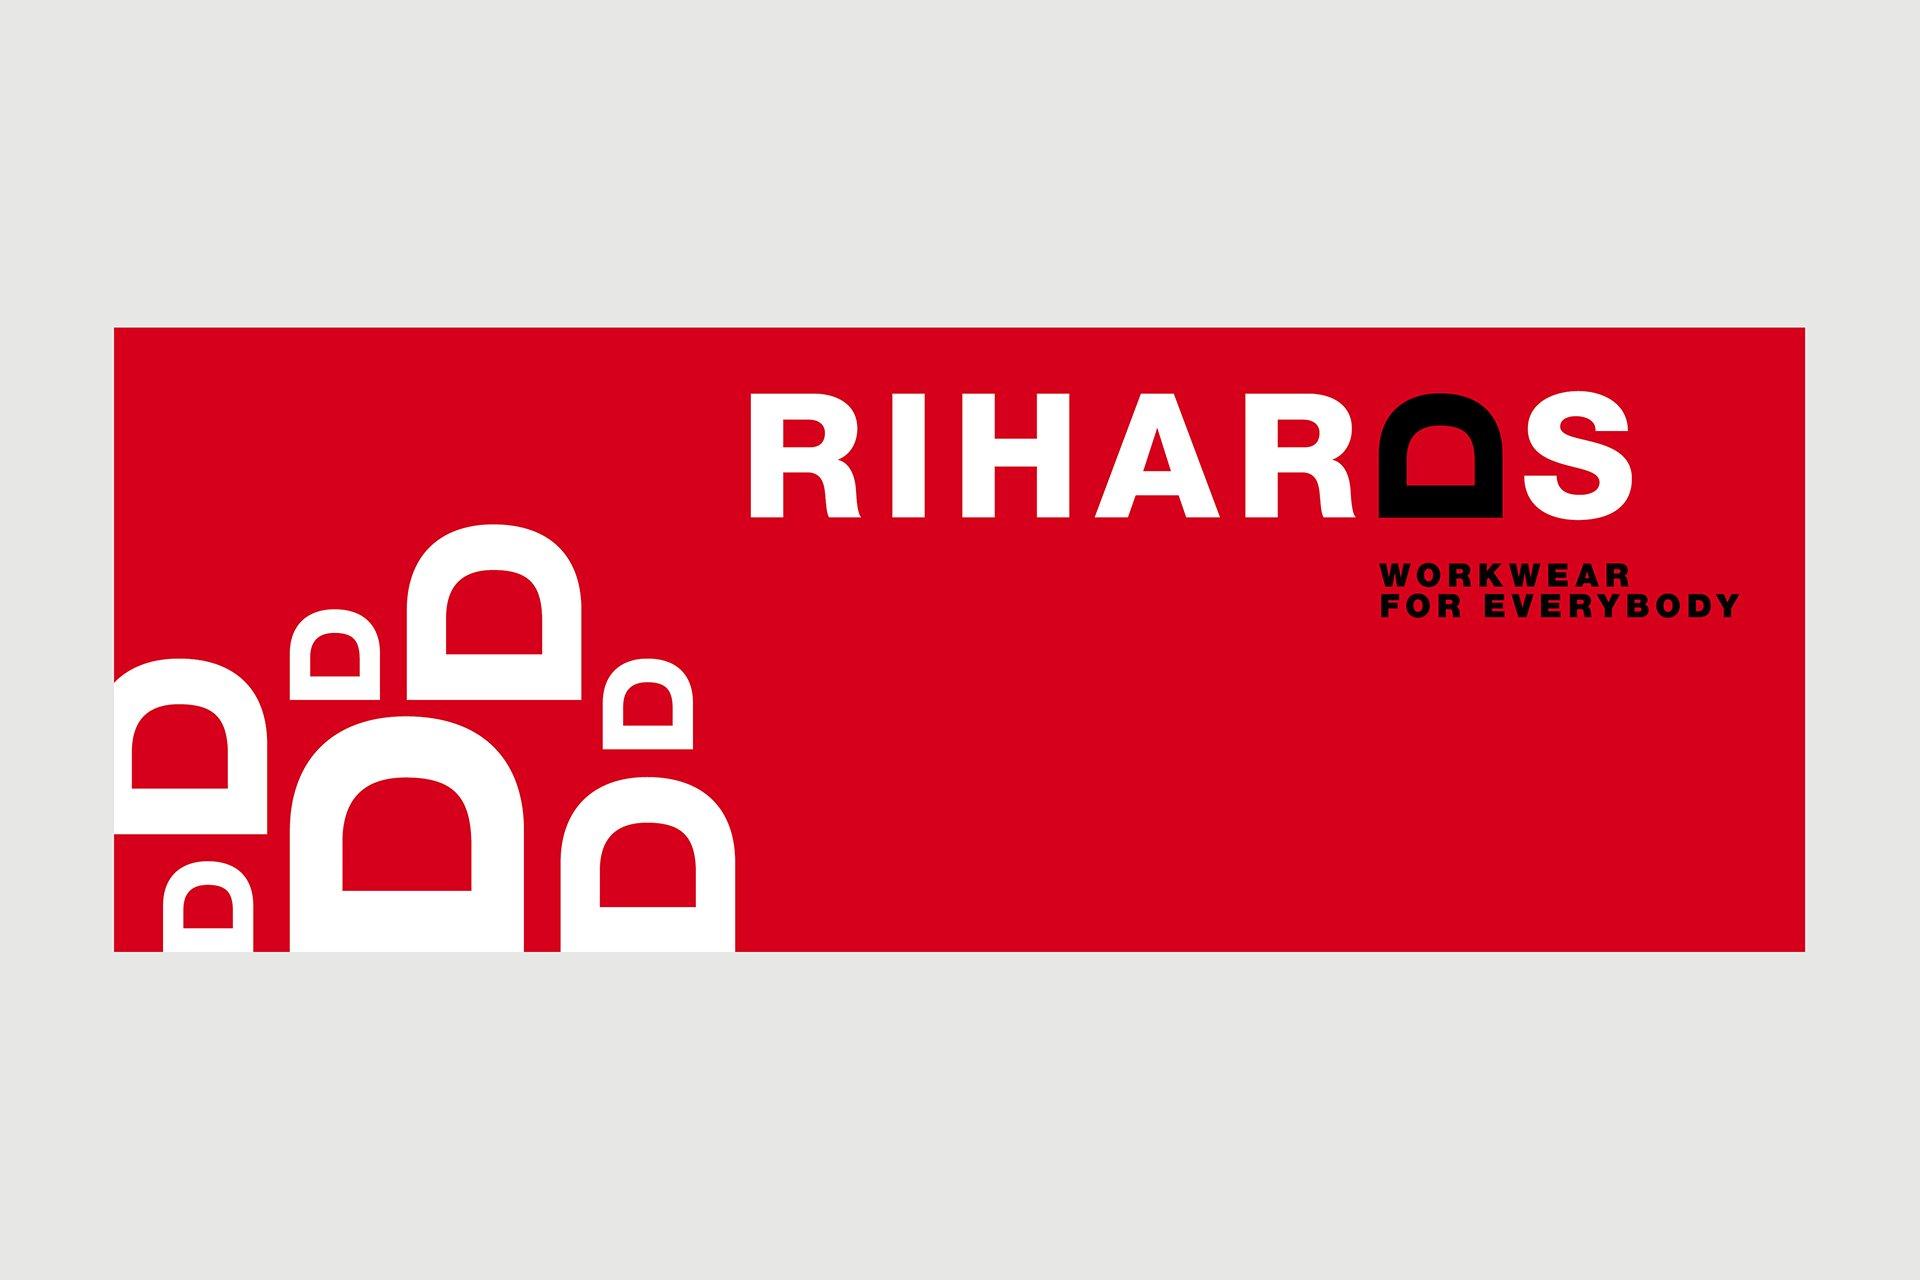 rihards_coverfoto_